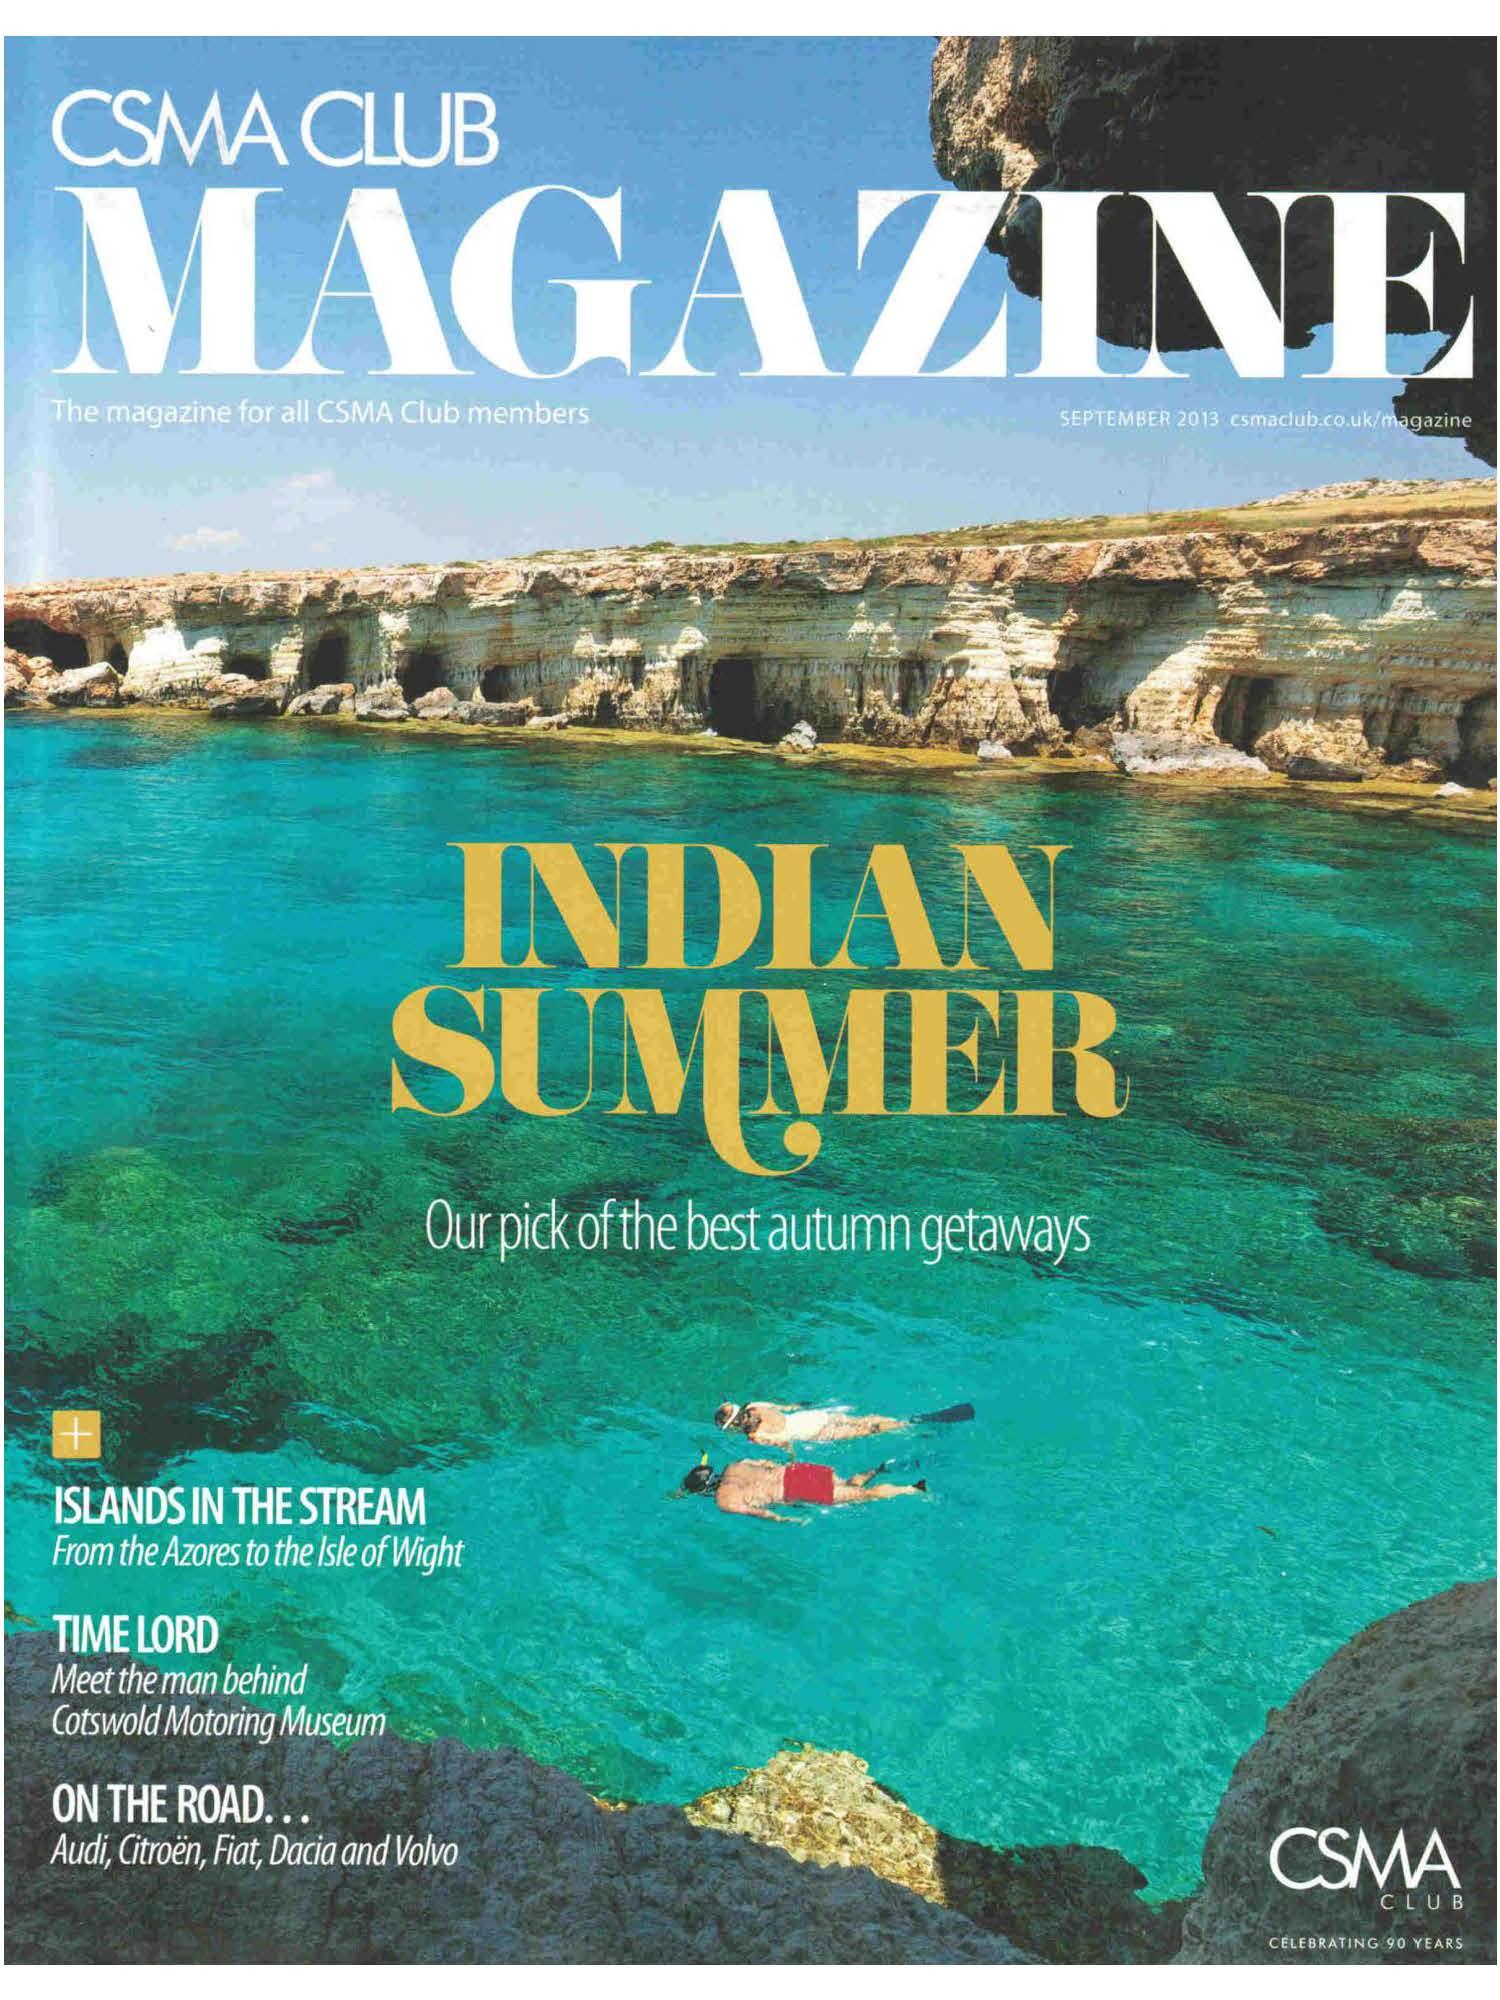 dog, dogs, style, magazine, press, editorial, csma, club, indian summer